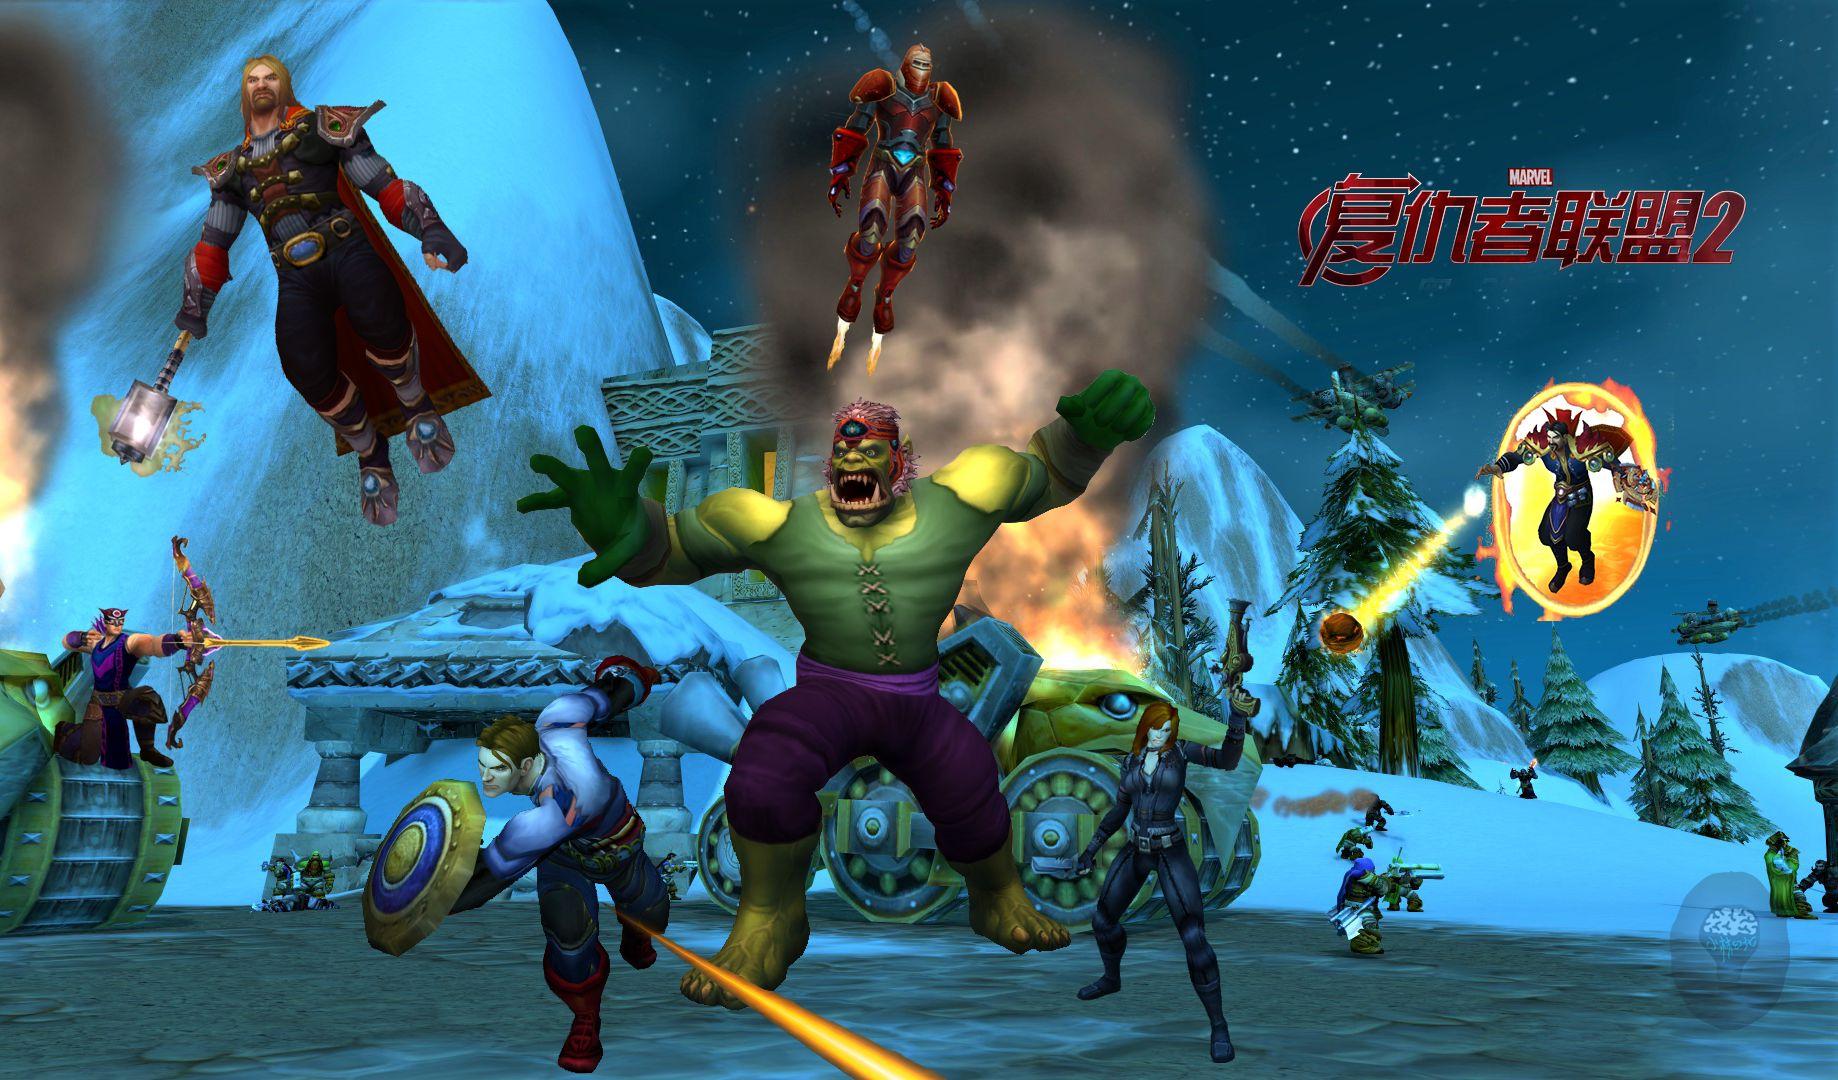 WoW Transmog Avengers title